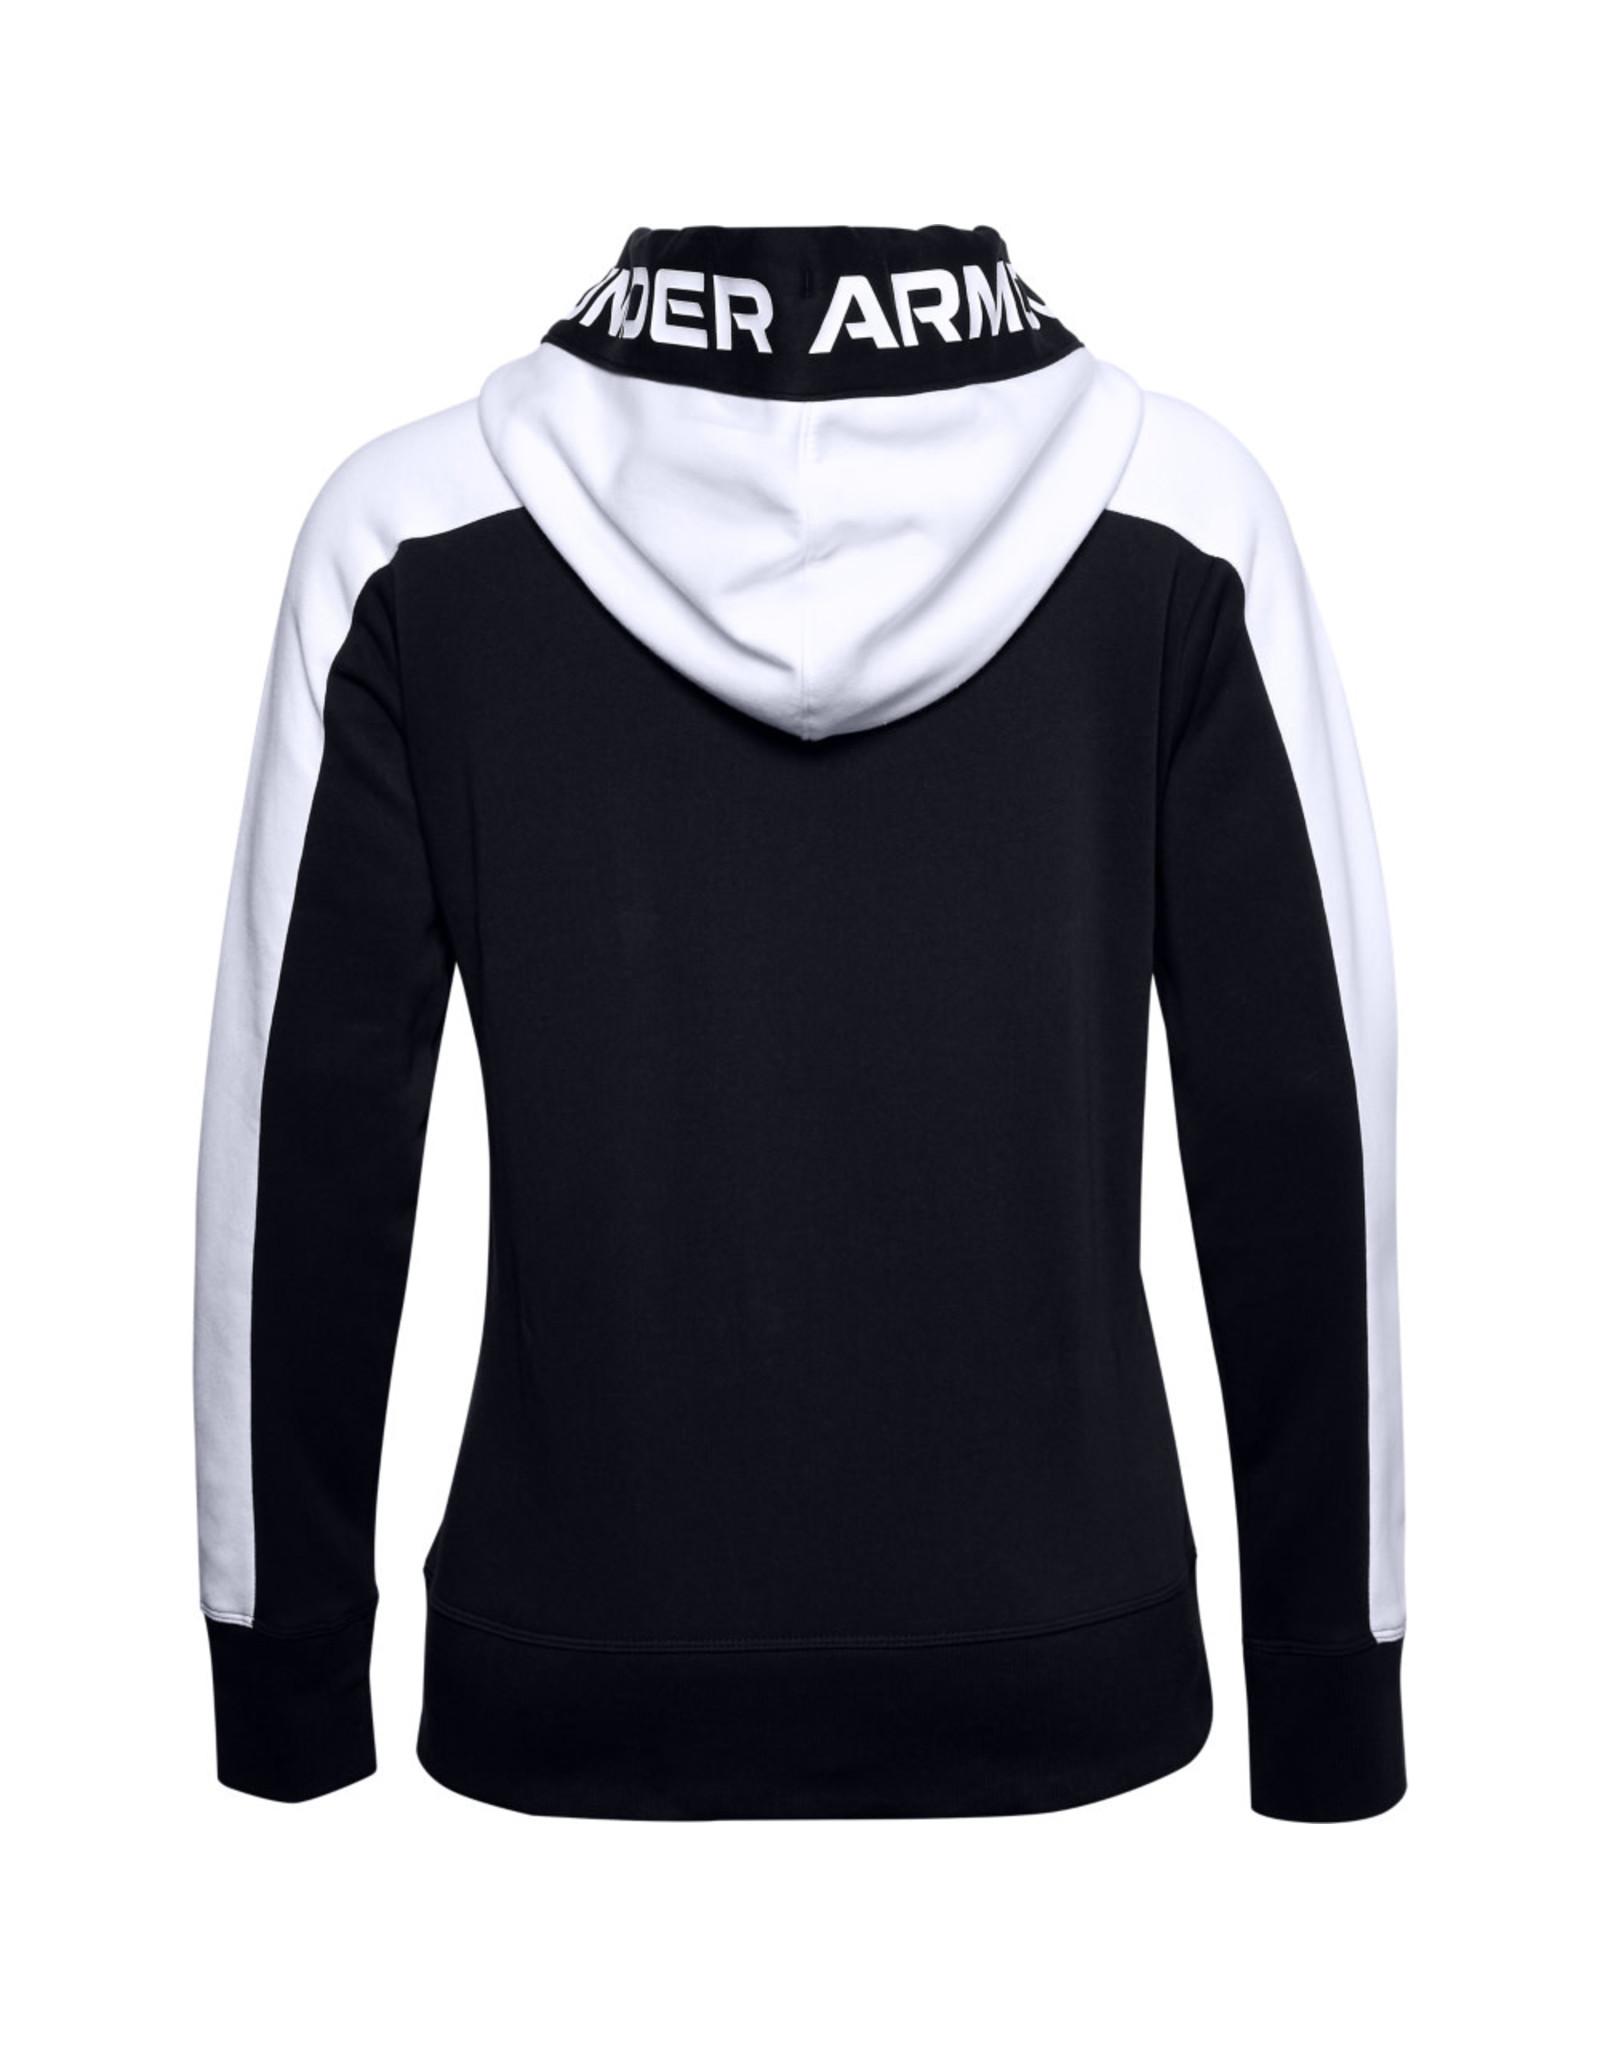 Under Armour Rival Flece Grphic CB Hoodie - Black-White-White